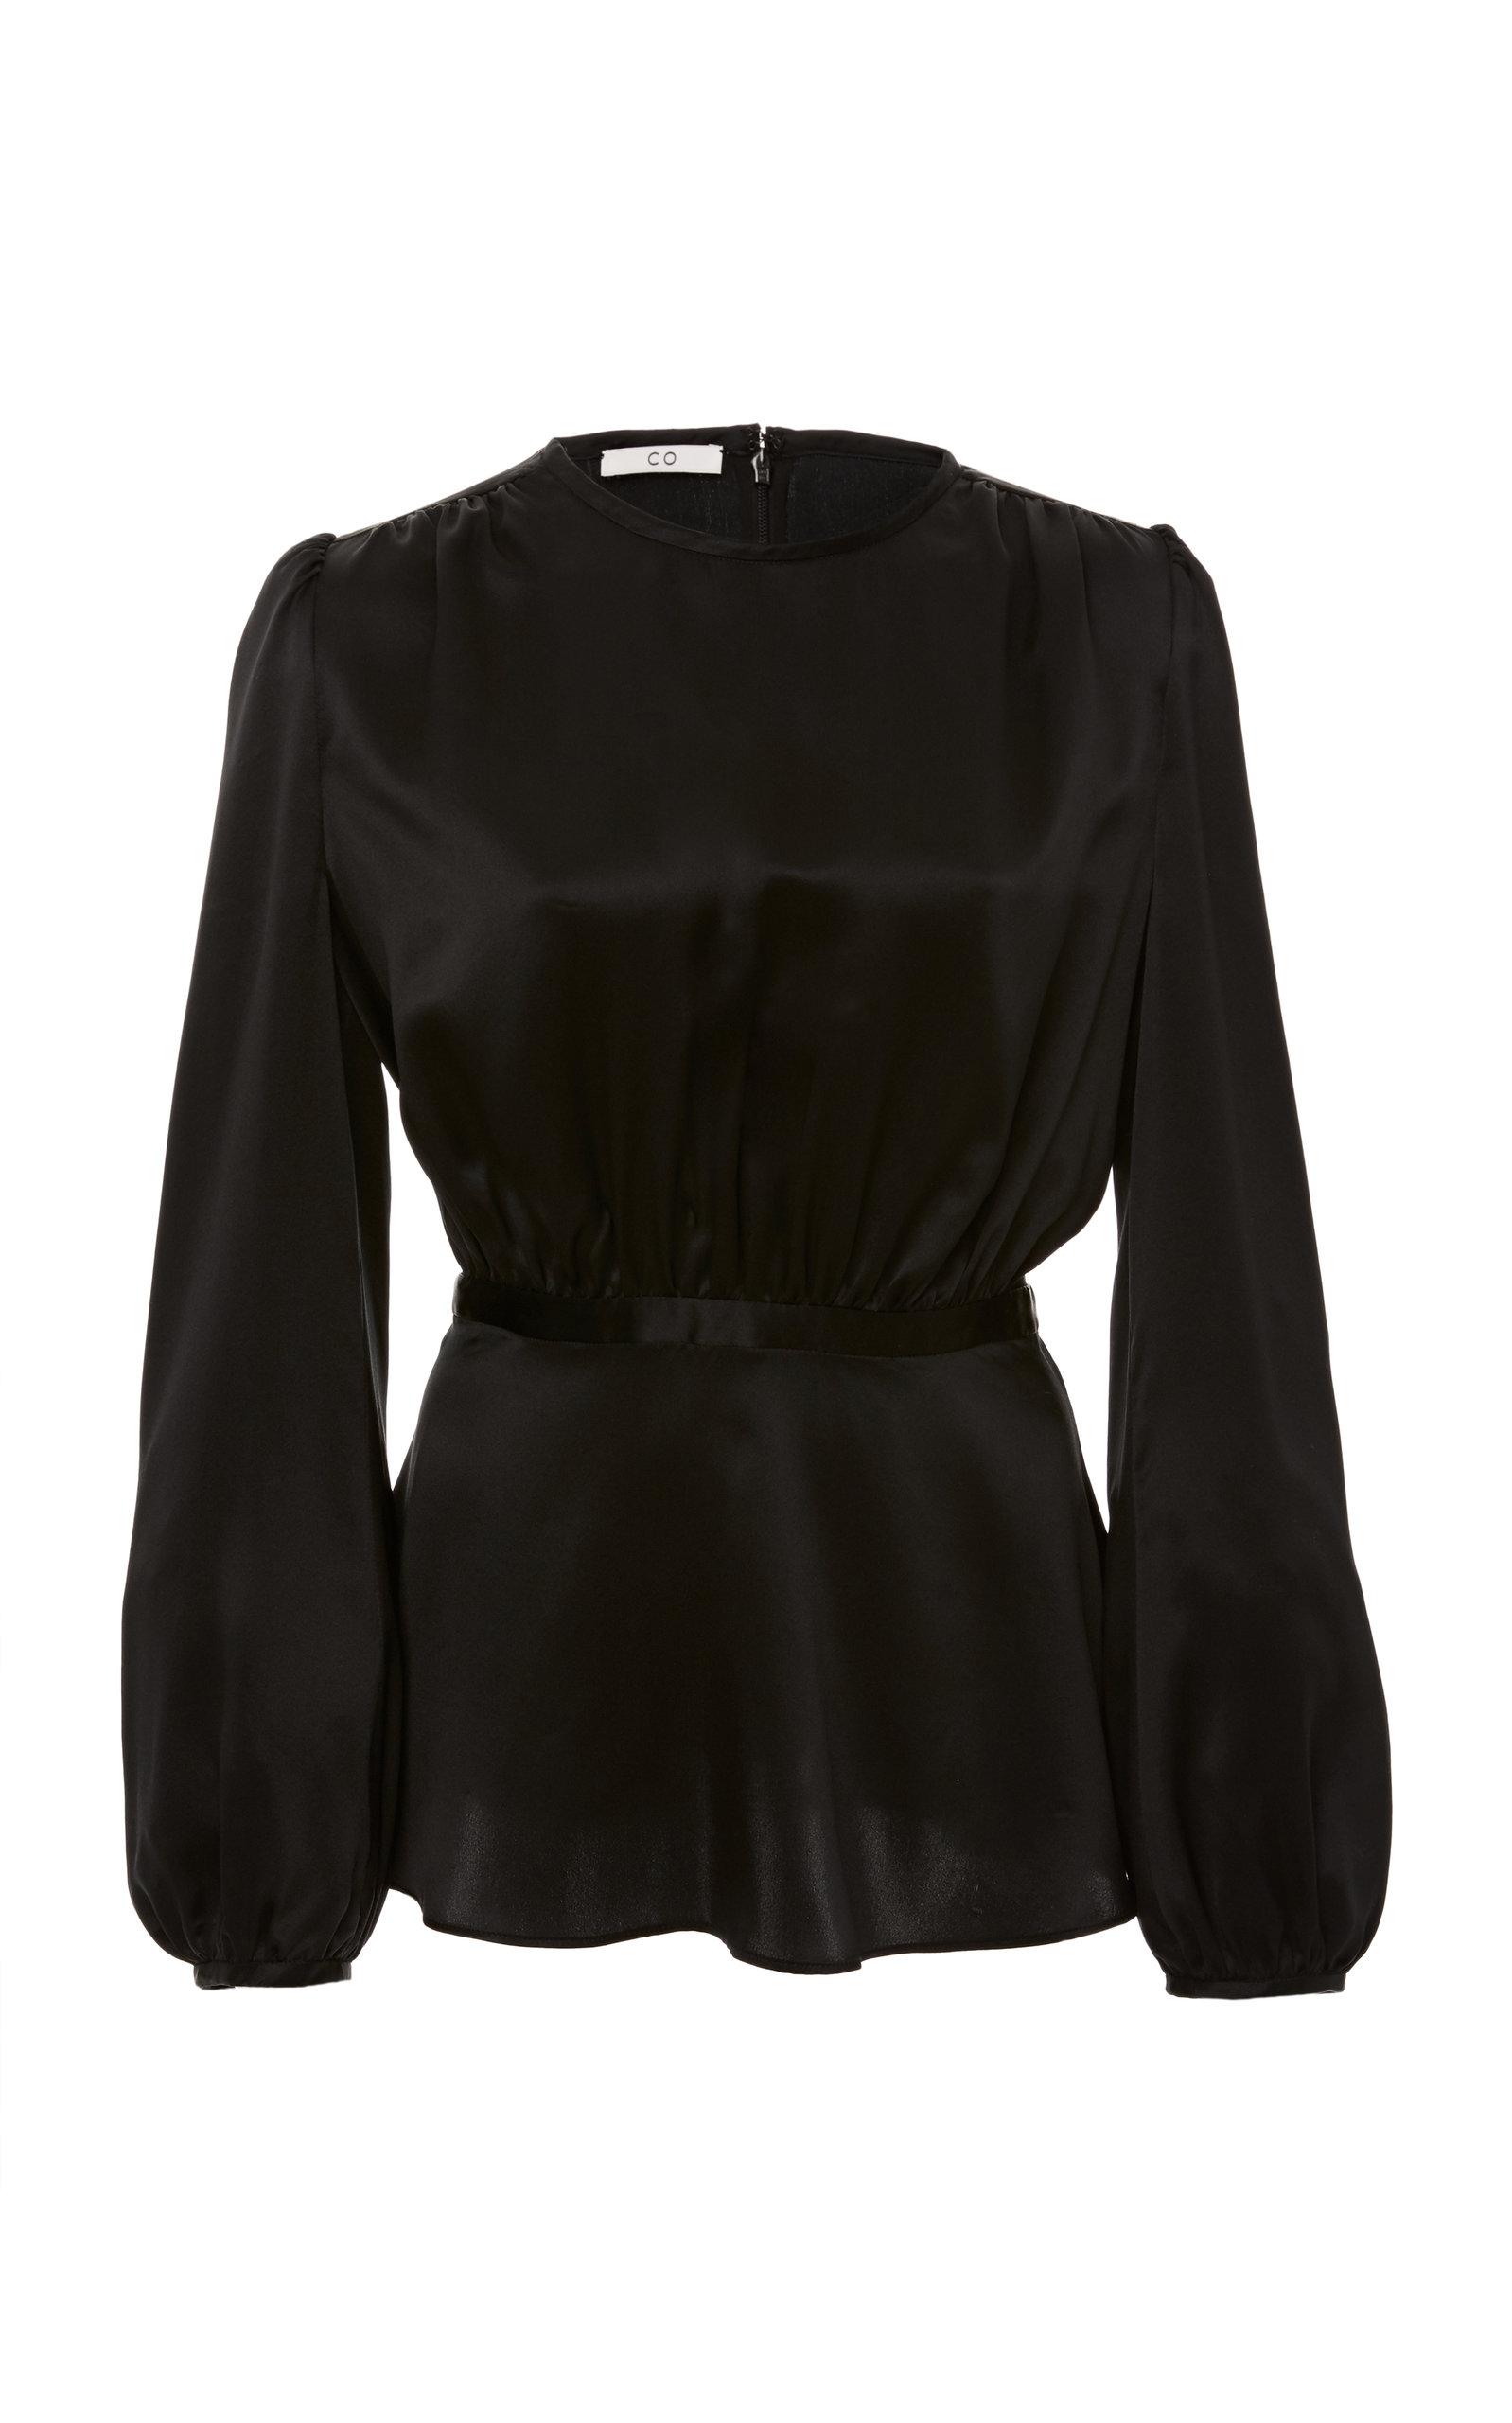 Jewel-Neck Long-Sleeve Crepe Back Satin Blouse in Black